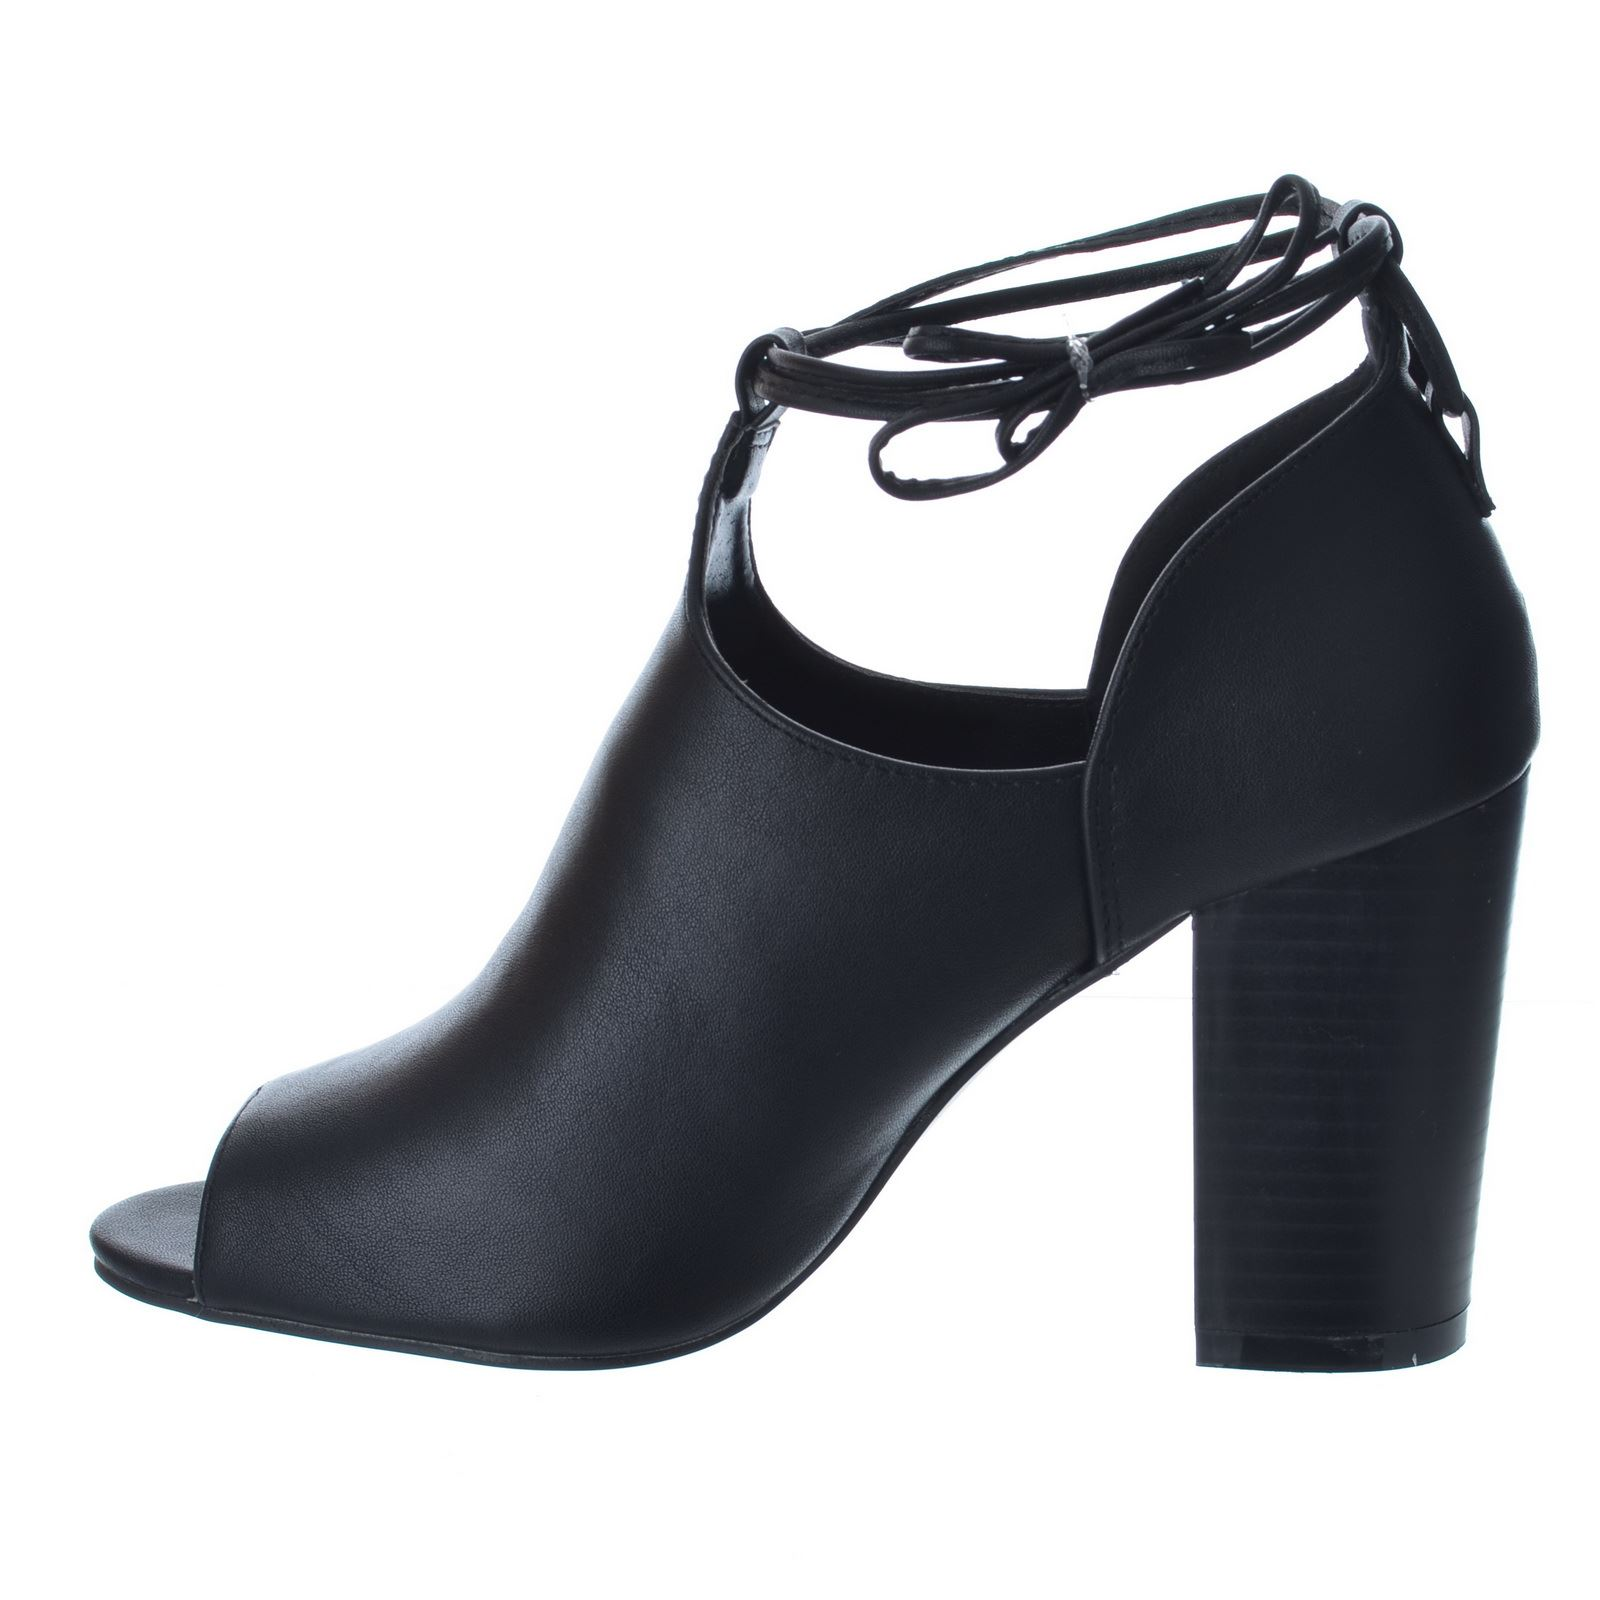 new womens mid block heel peep toe spiral lace up